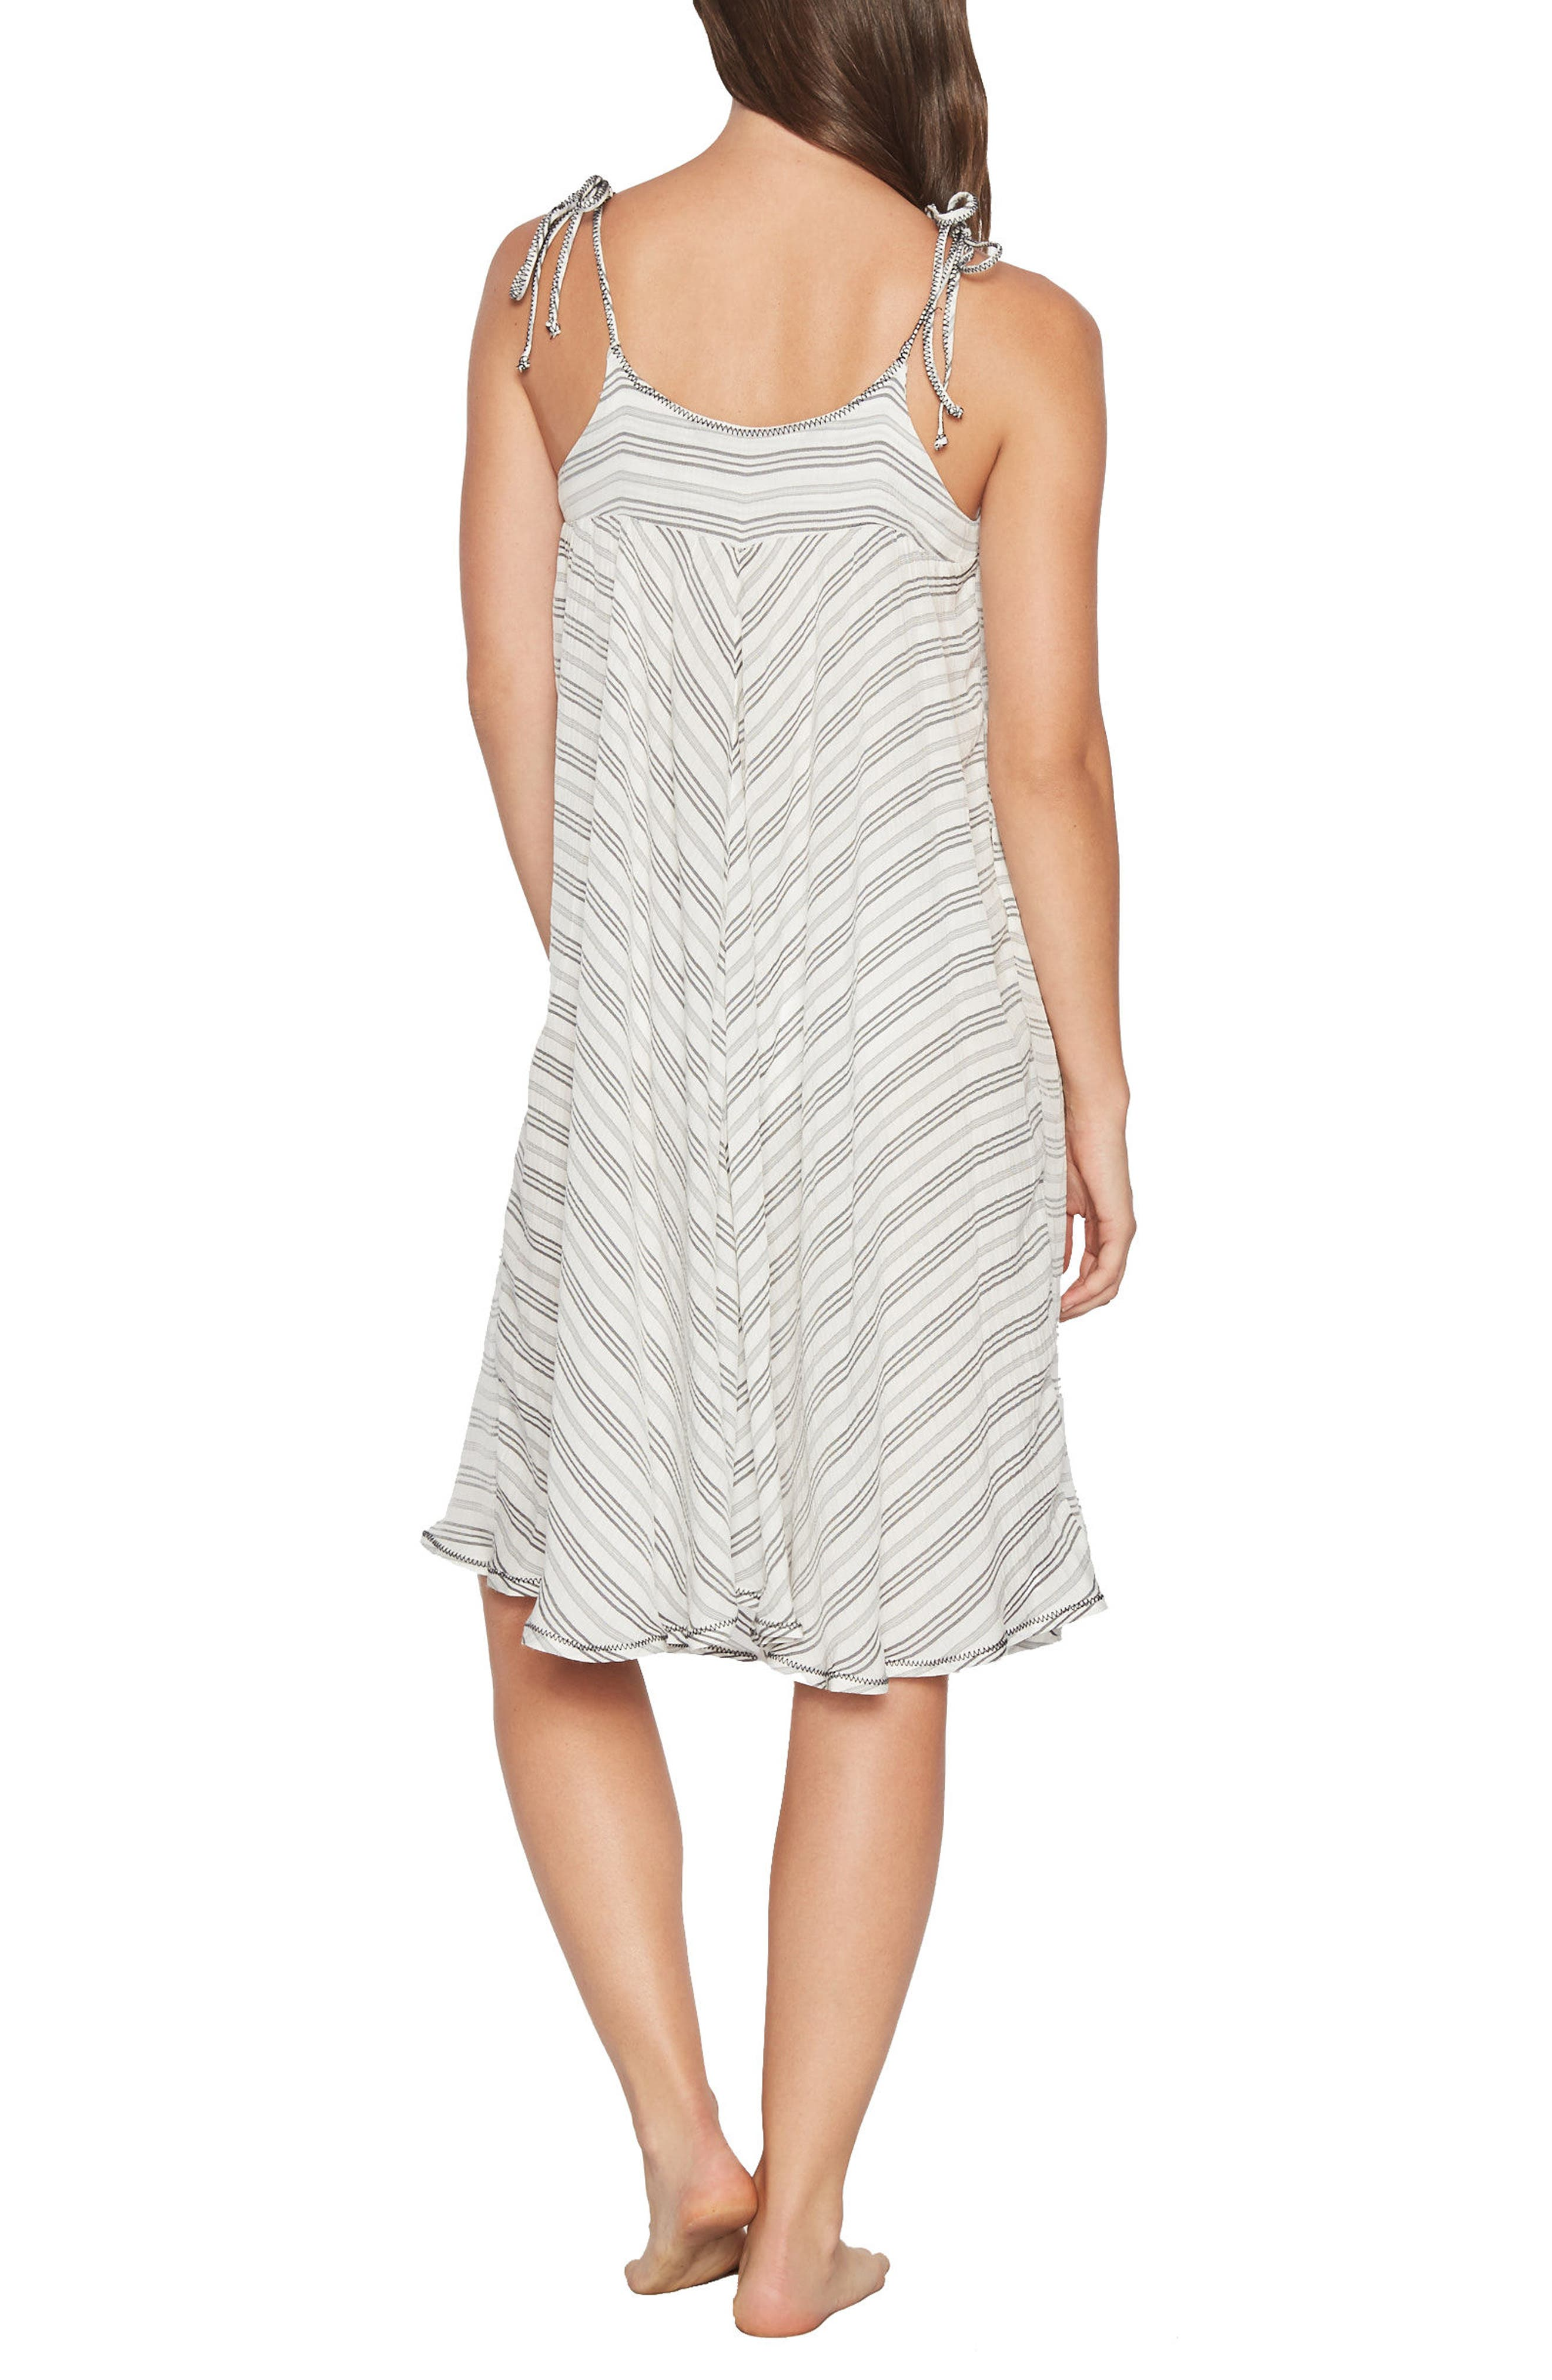 Norah Stripe Cover-Up Dress,                             Alternate thumbnail 2, color,                             023